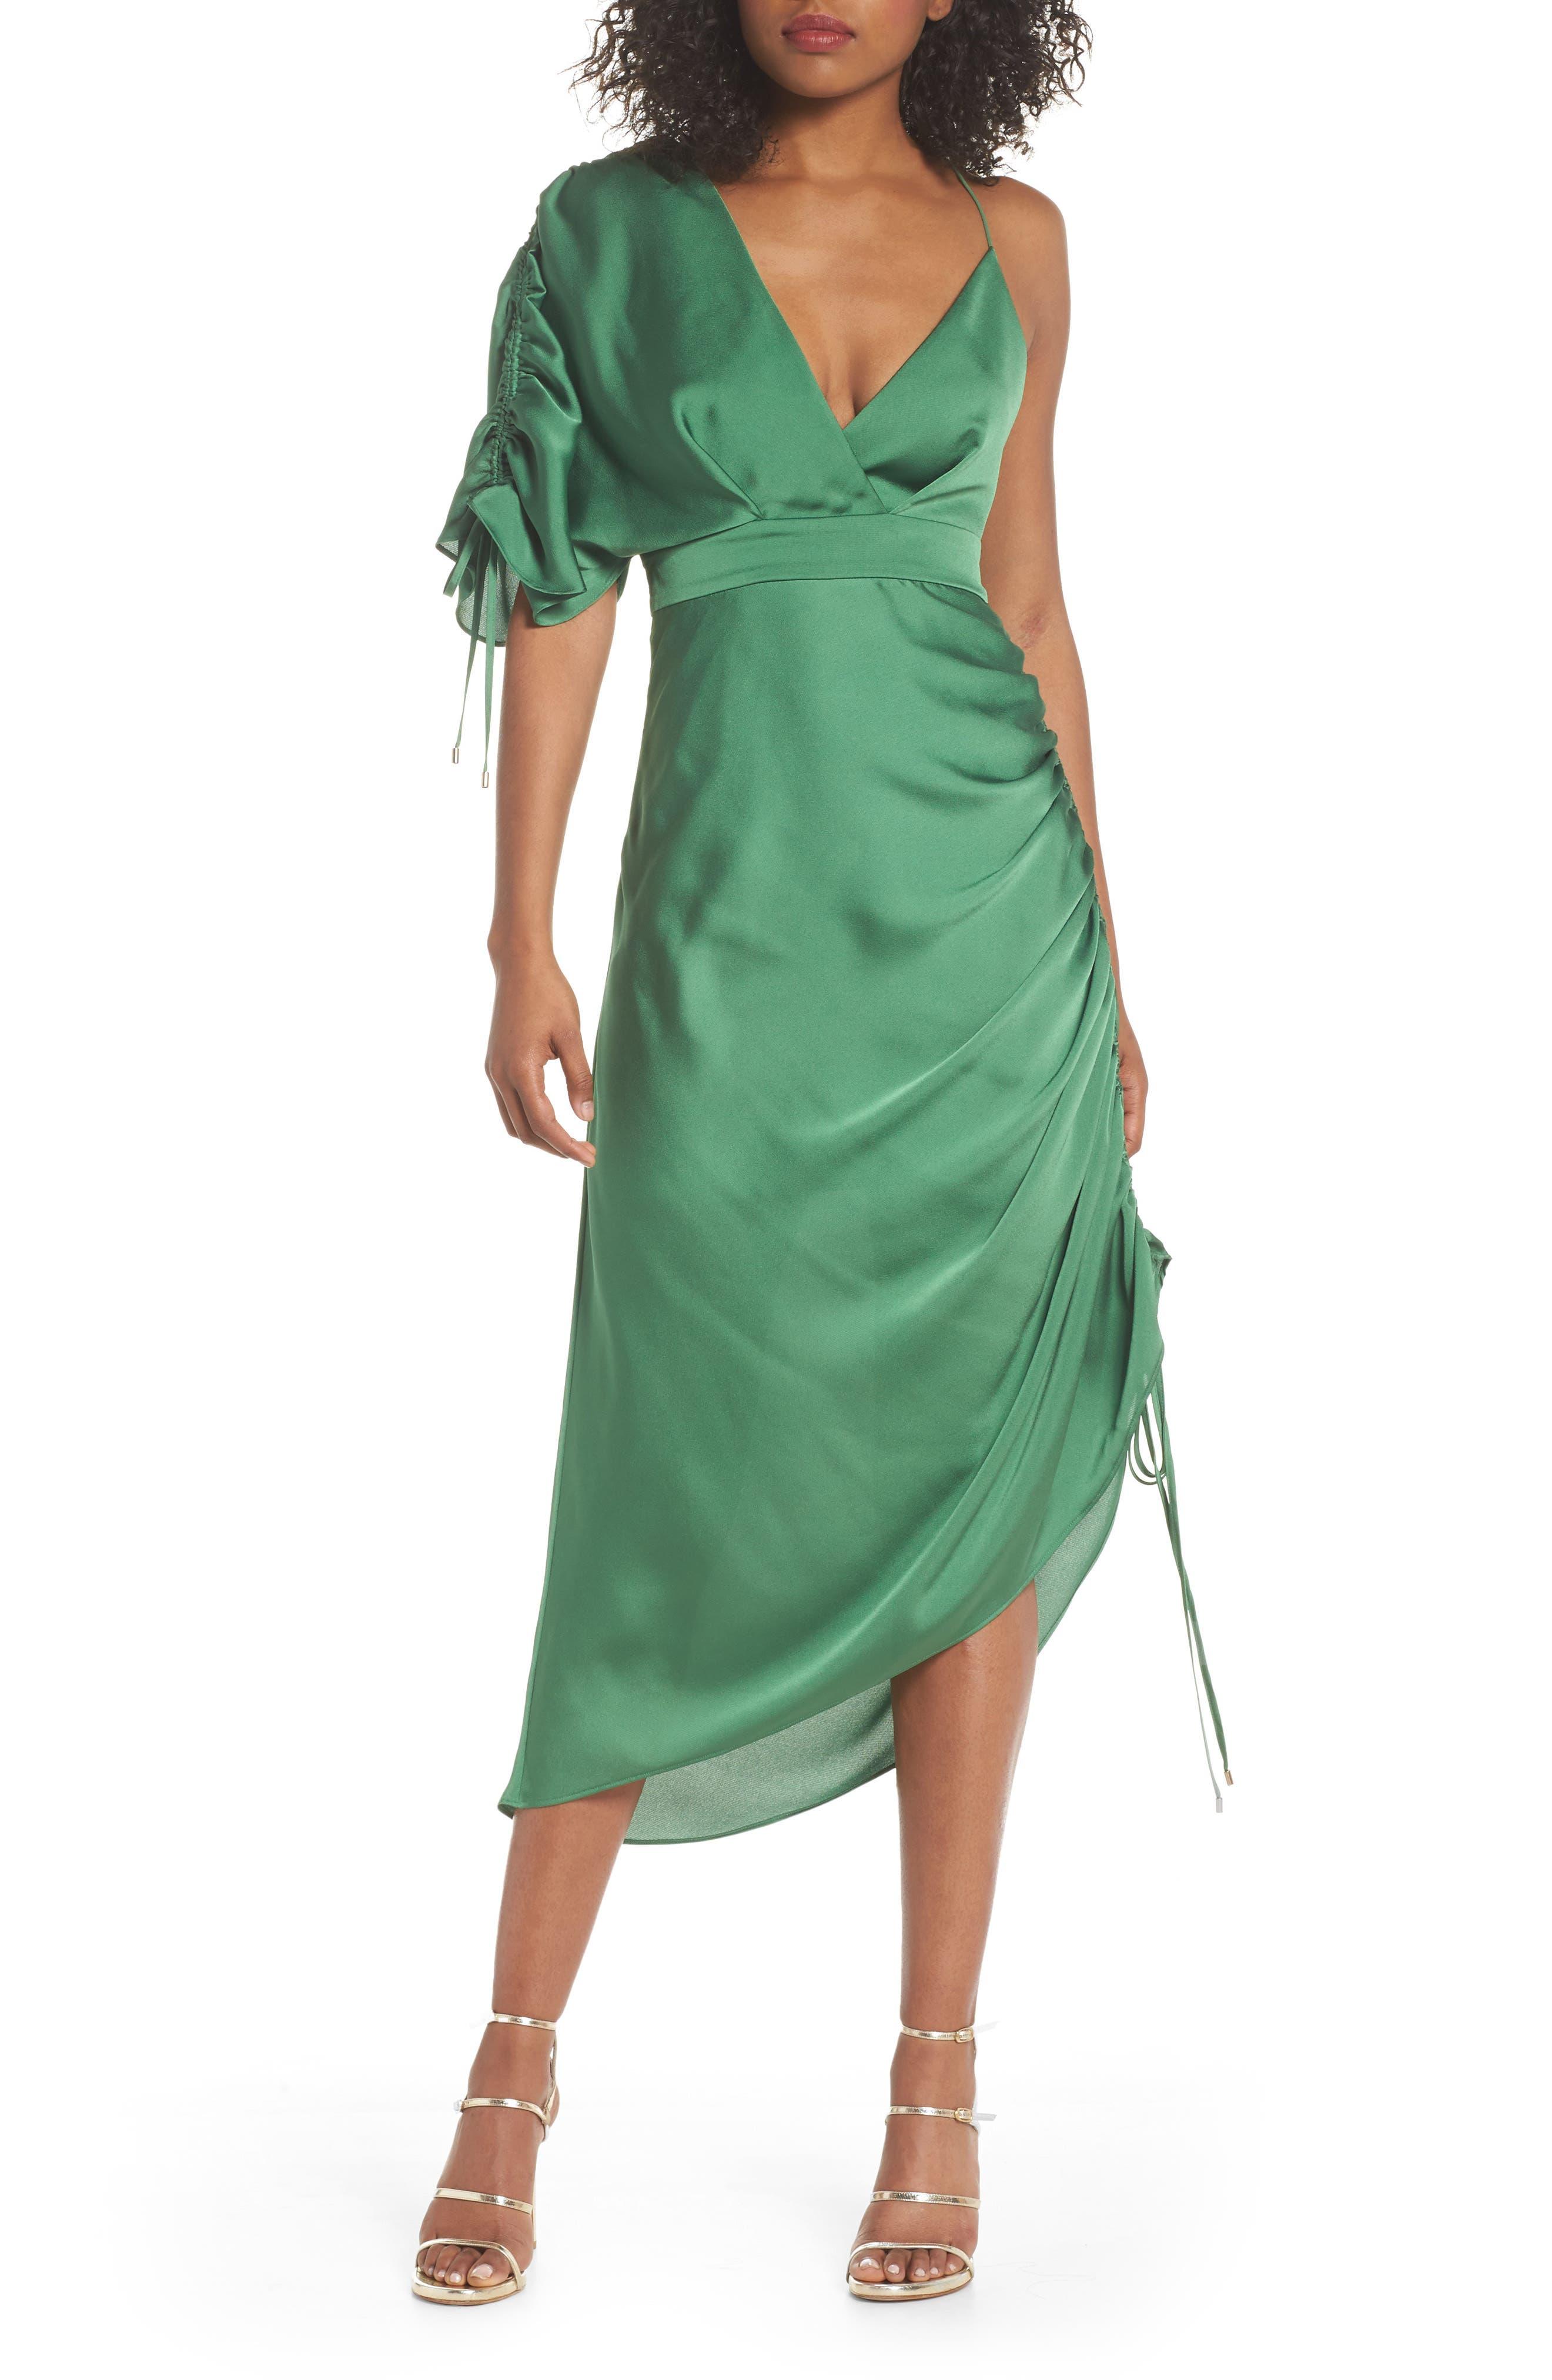 I've Got You Asymmetrical Satin Dress,                         Main,                         color, Emerald Green